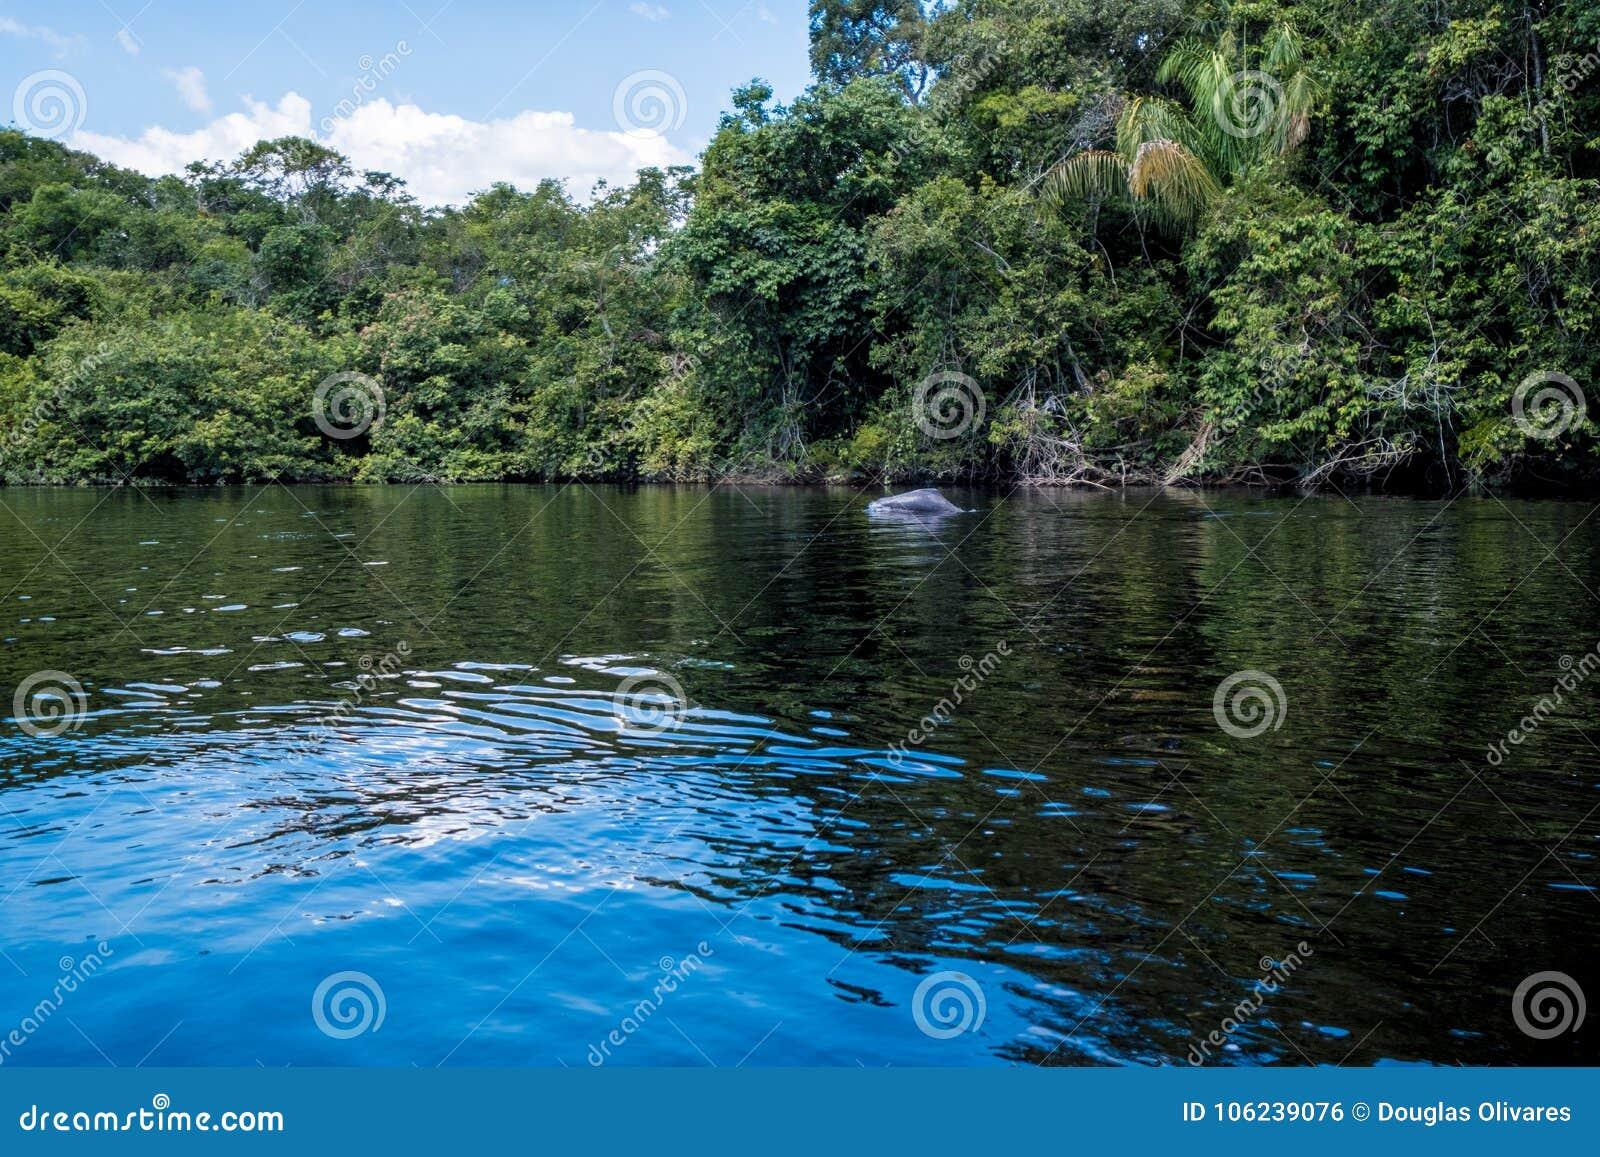 Playful River Dolphin, Amazon Rainforest